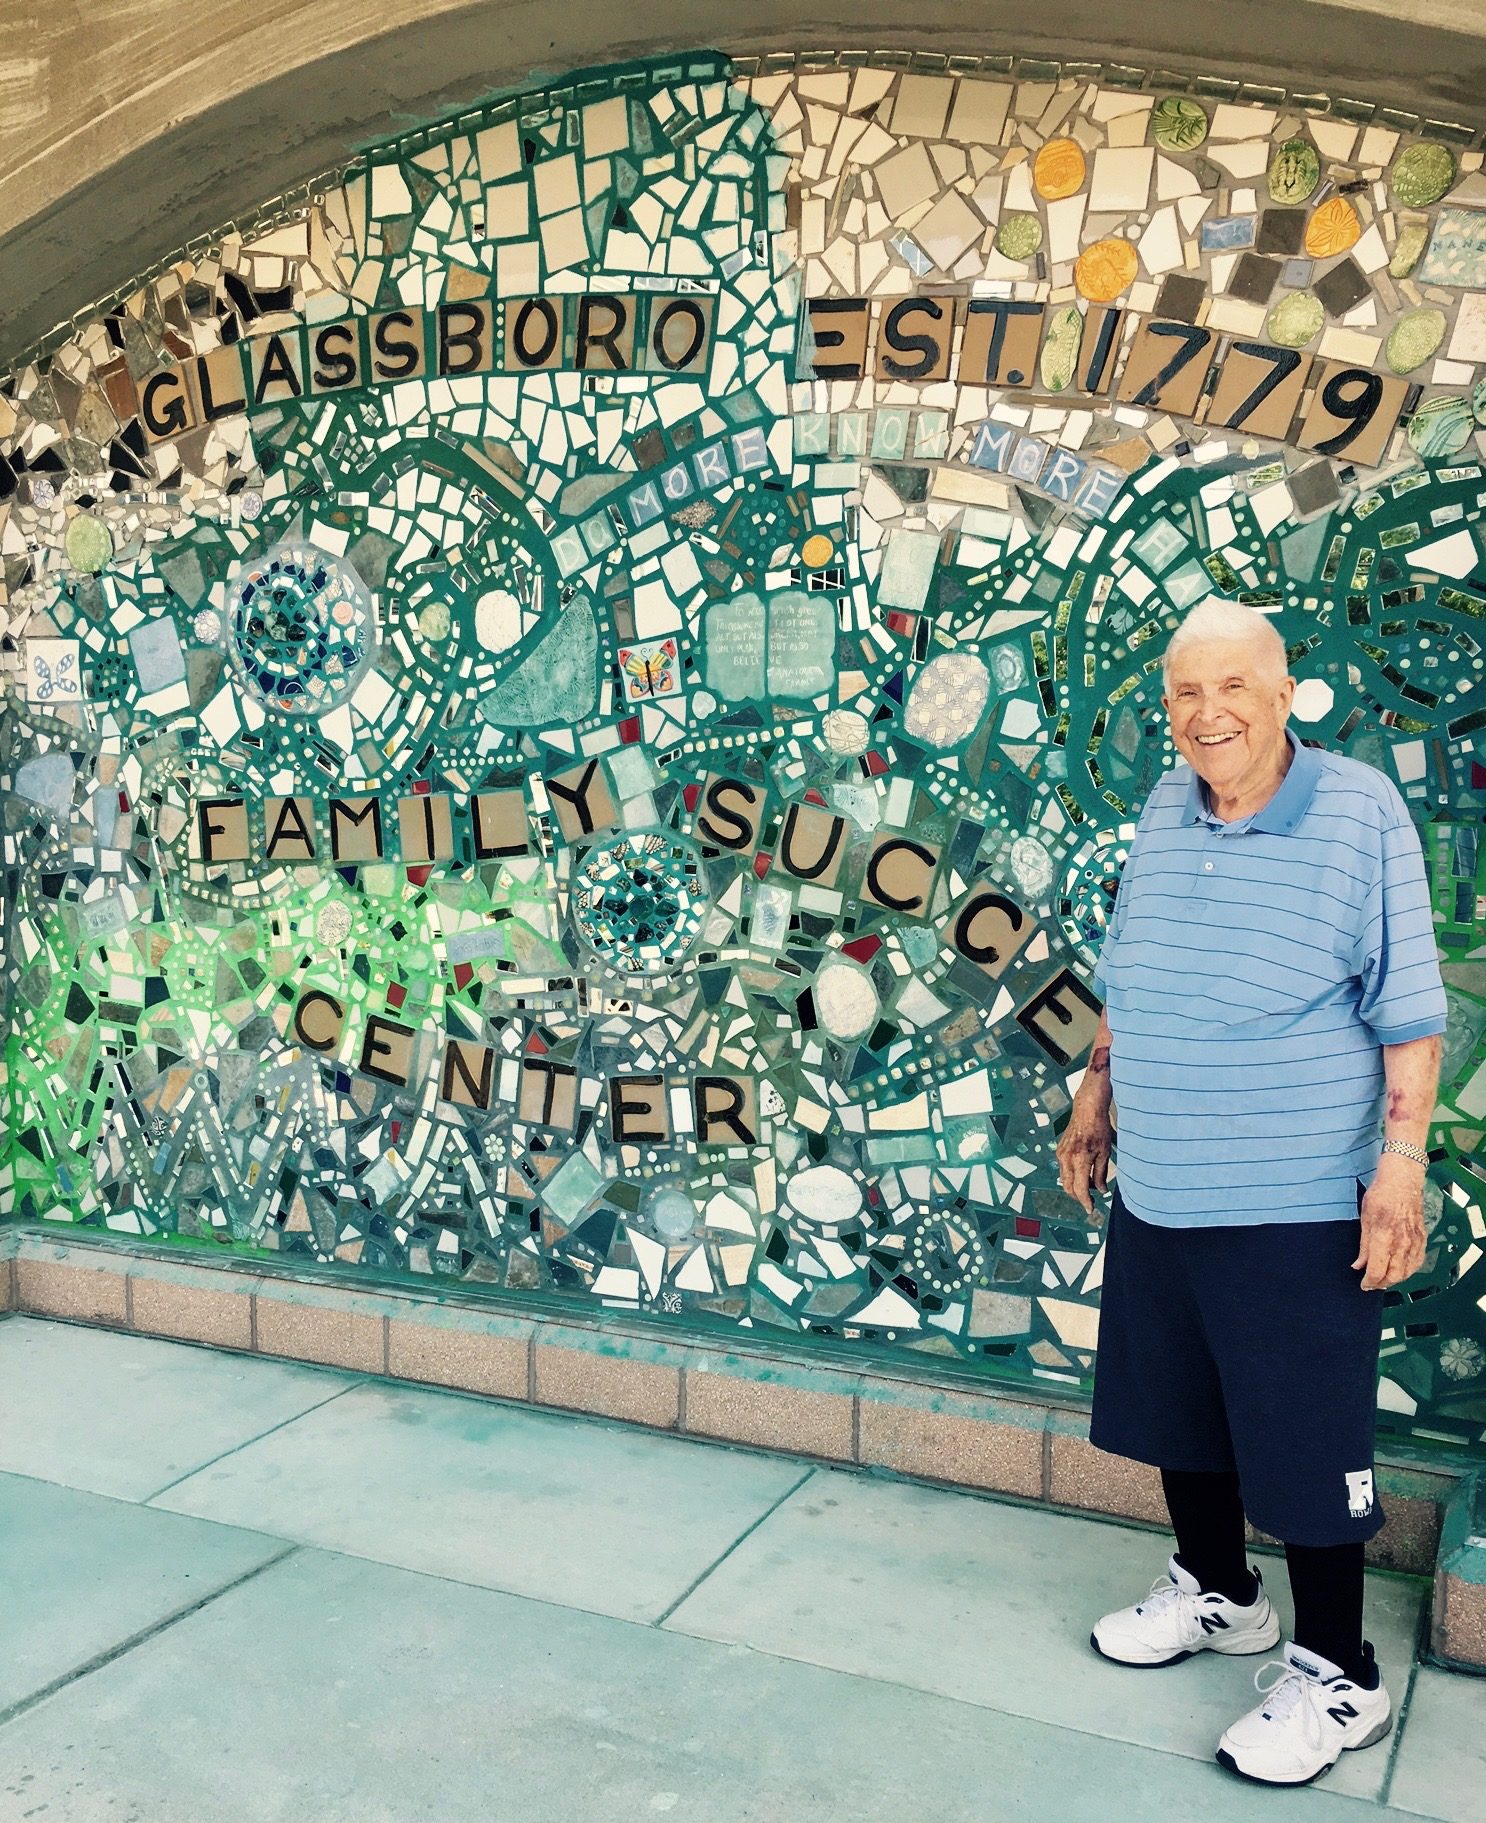 Isaiah Zagar Mosaic Mural for glassboro34.jpg